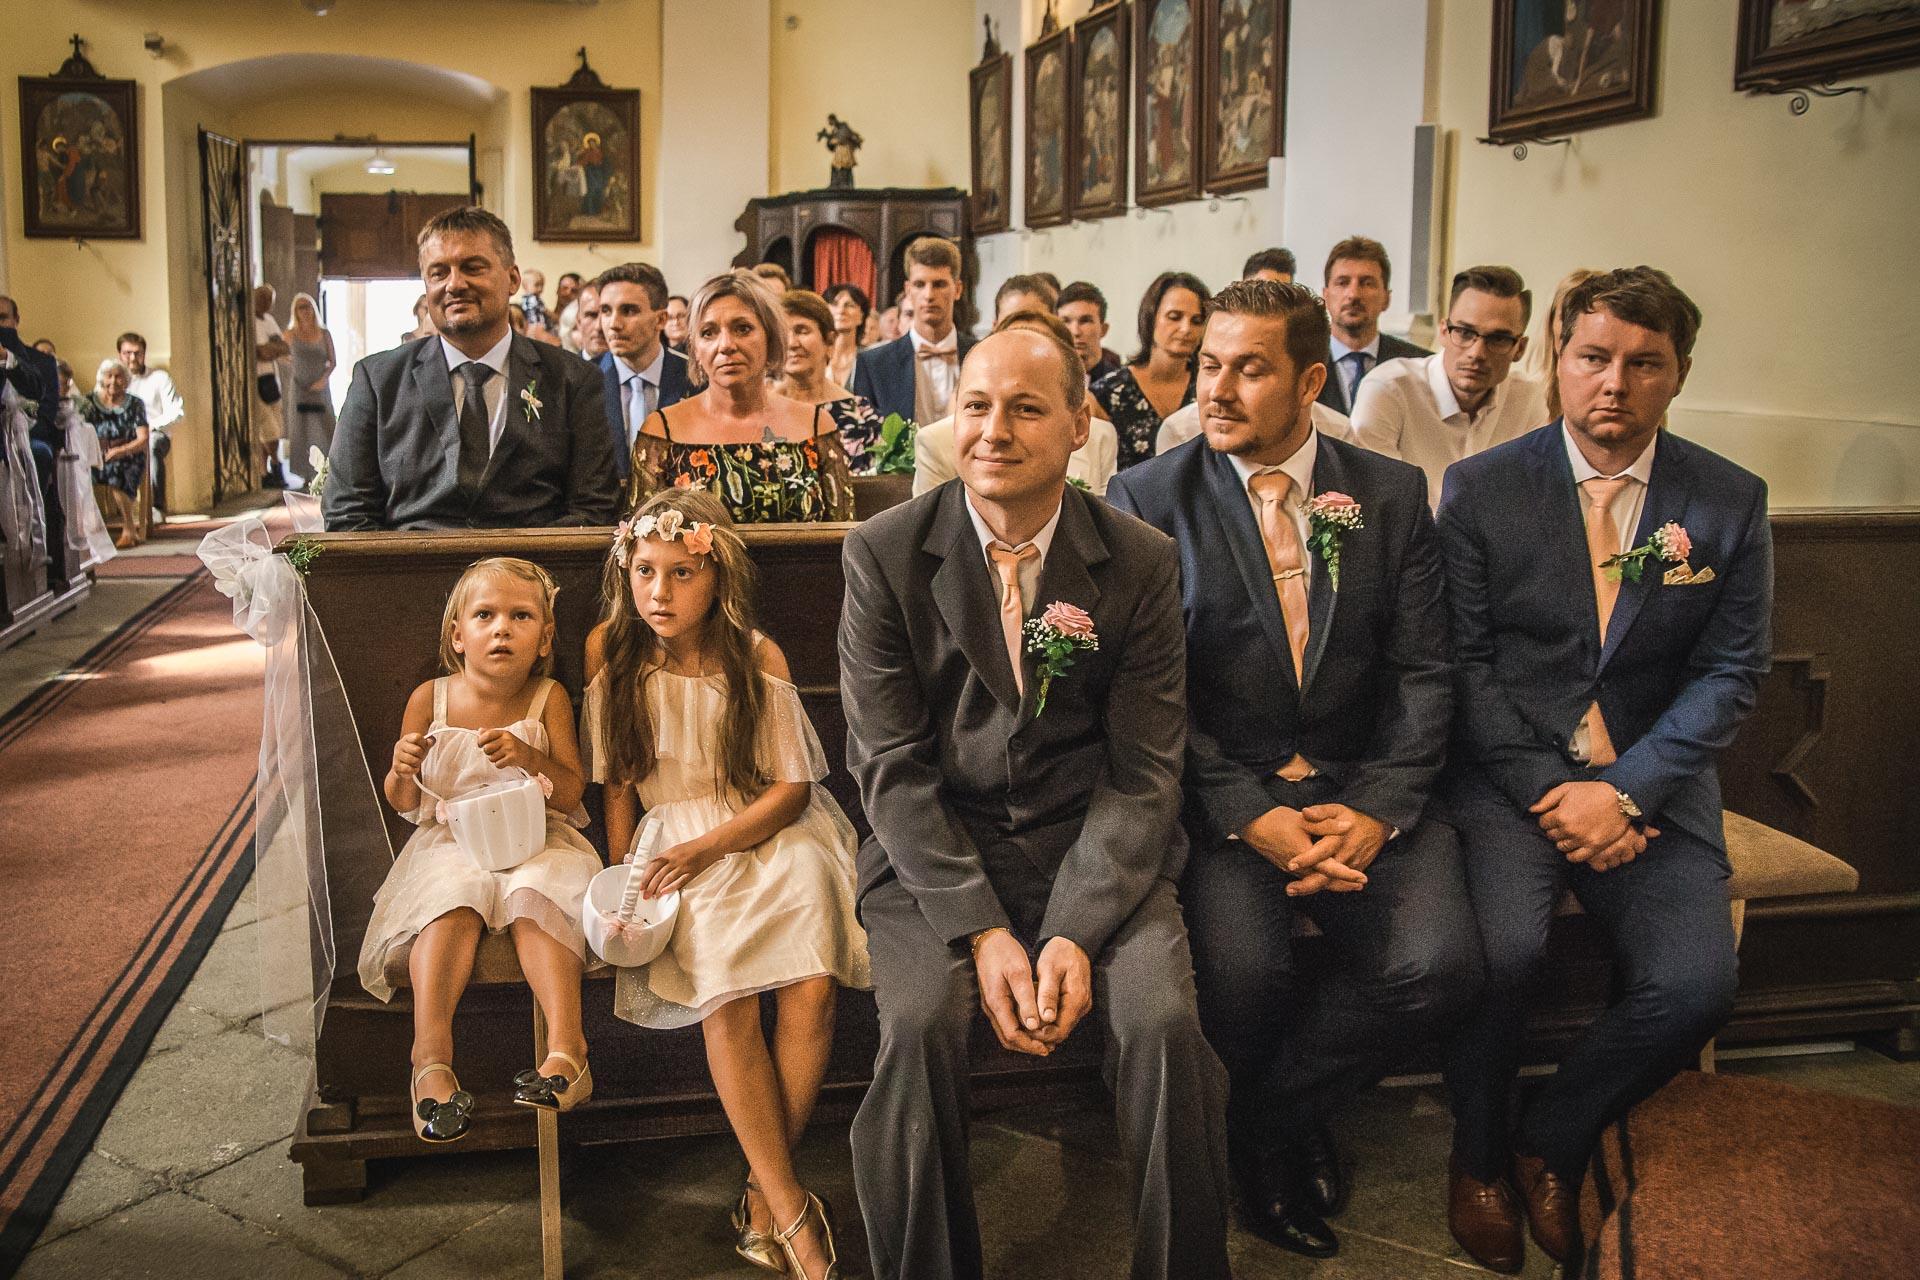 svatební-fotograf-wedding-svatebni-video-orlík-vltava-kostel-statek-stodola-boho-svatba-Beautyfoto-209